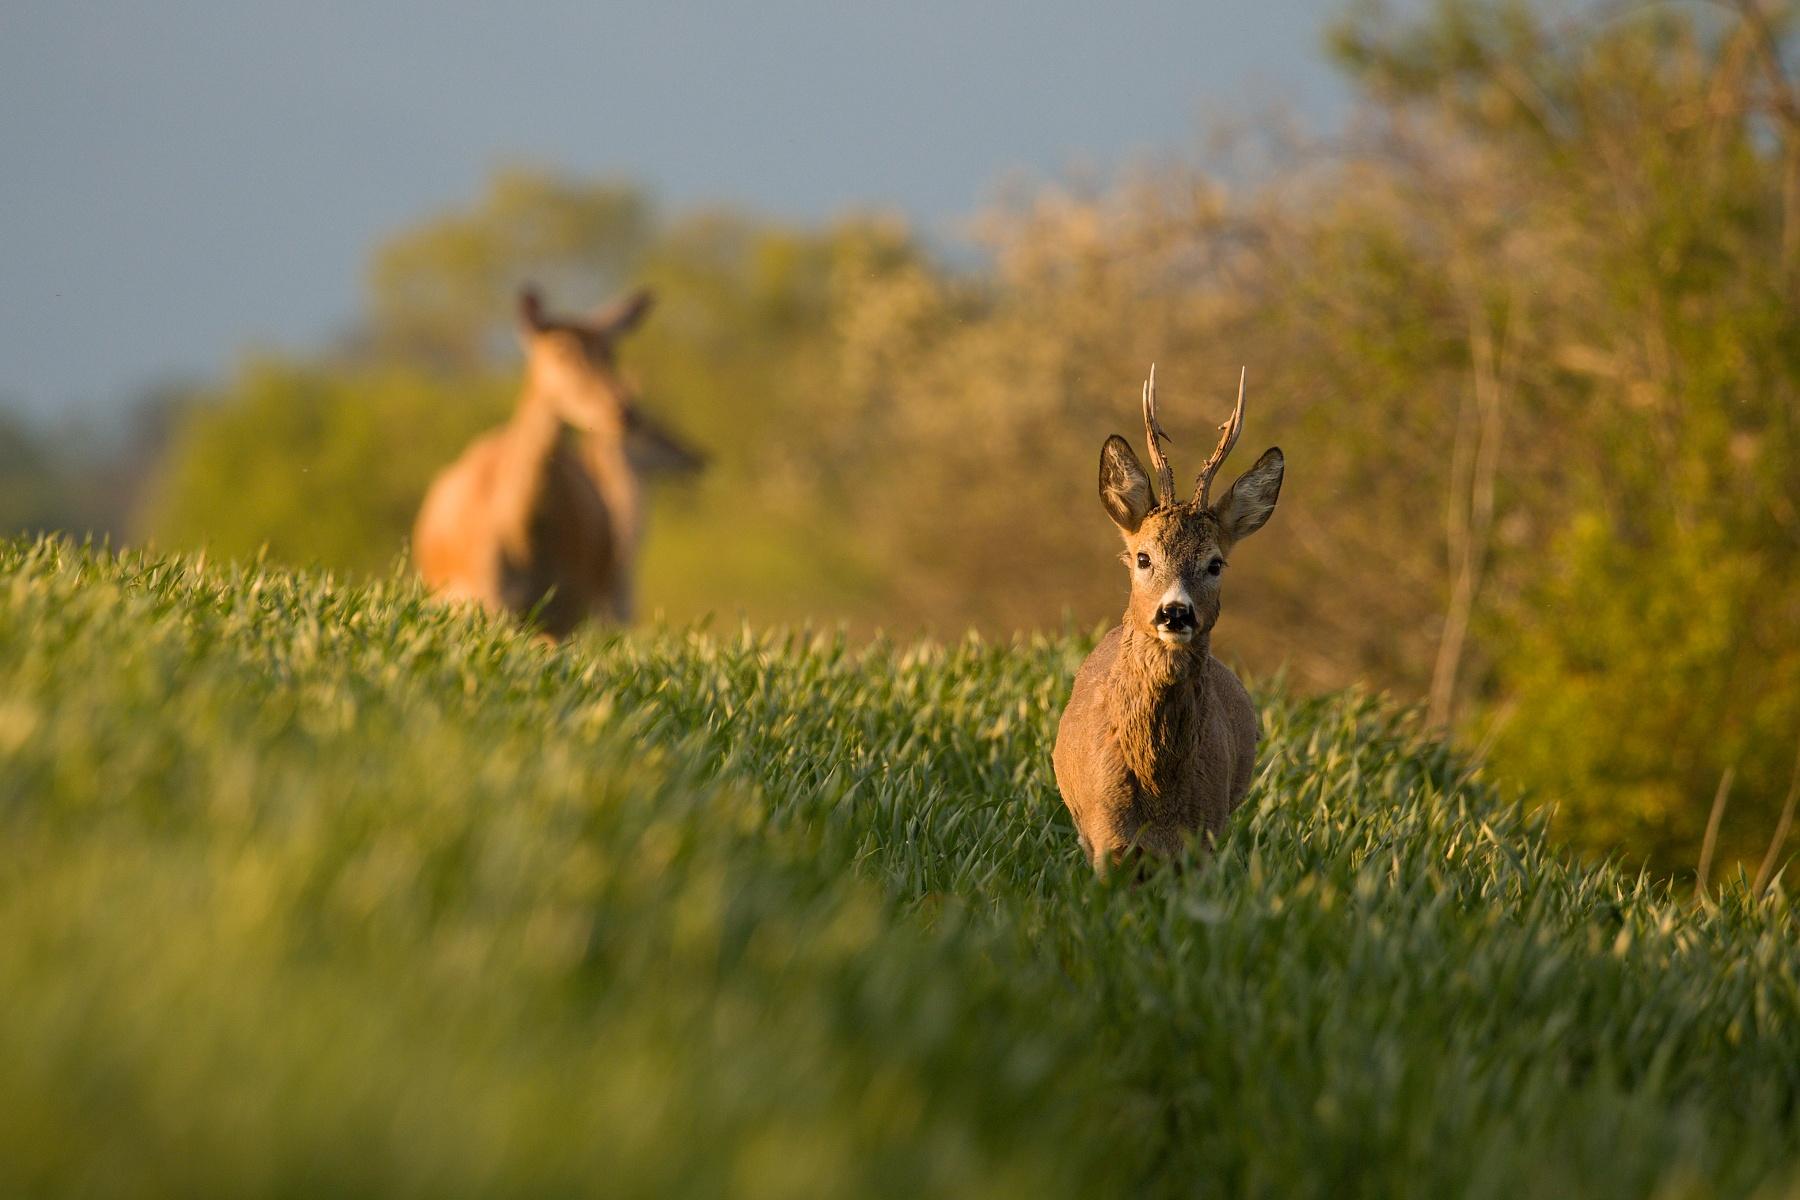 srnec lesný (Capreolus capreolus) Roe deer, Turčianska kotlina, Slovensko Canon EOS 6D mark II, Canon 100-400 mm f4.5-5.6 L IS II USM, 400 mm, f5.6, 1/400, ISO 400, 16. máj 2020